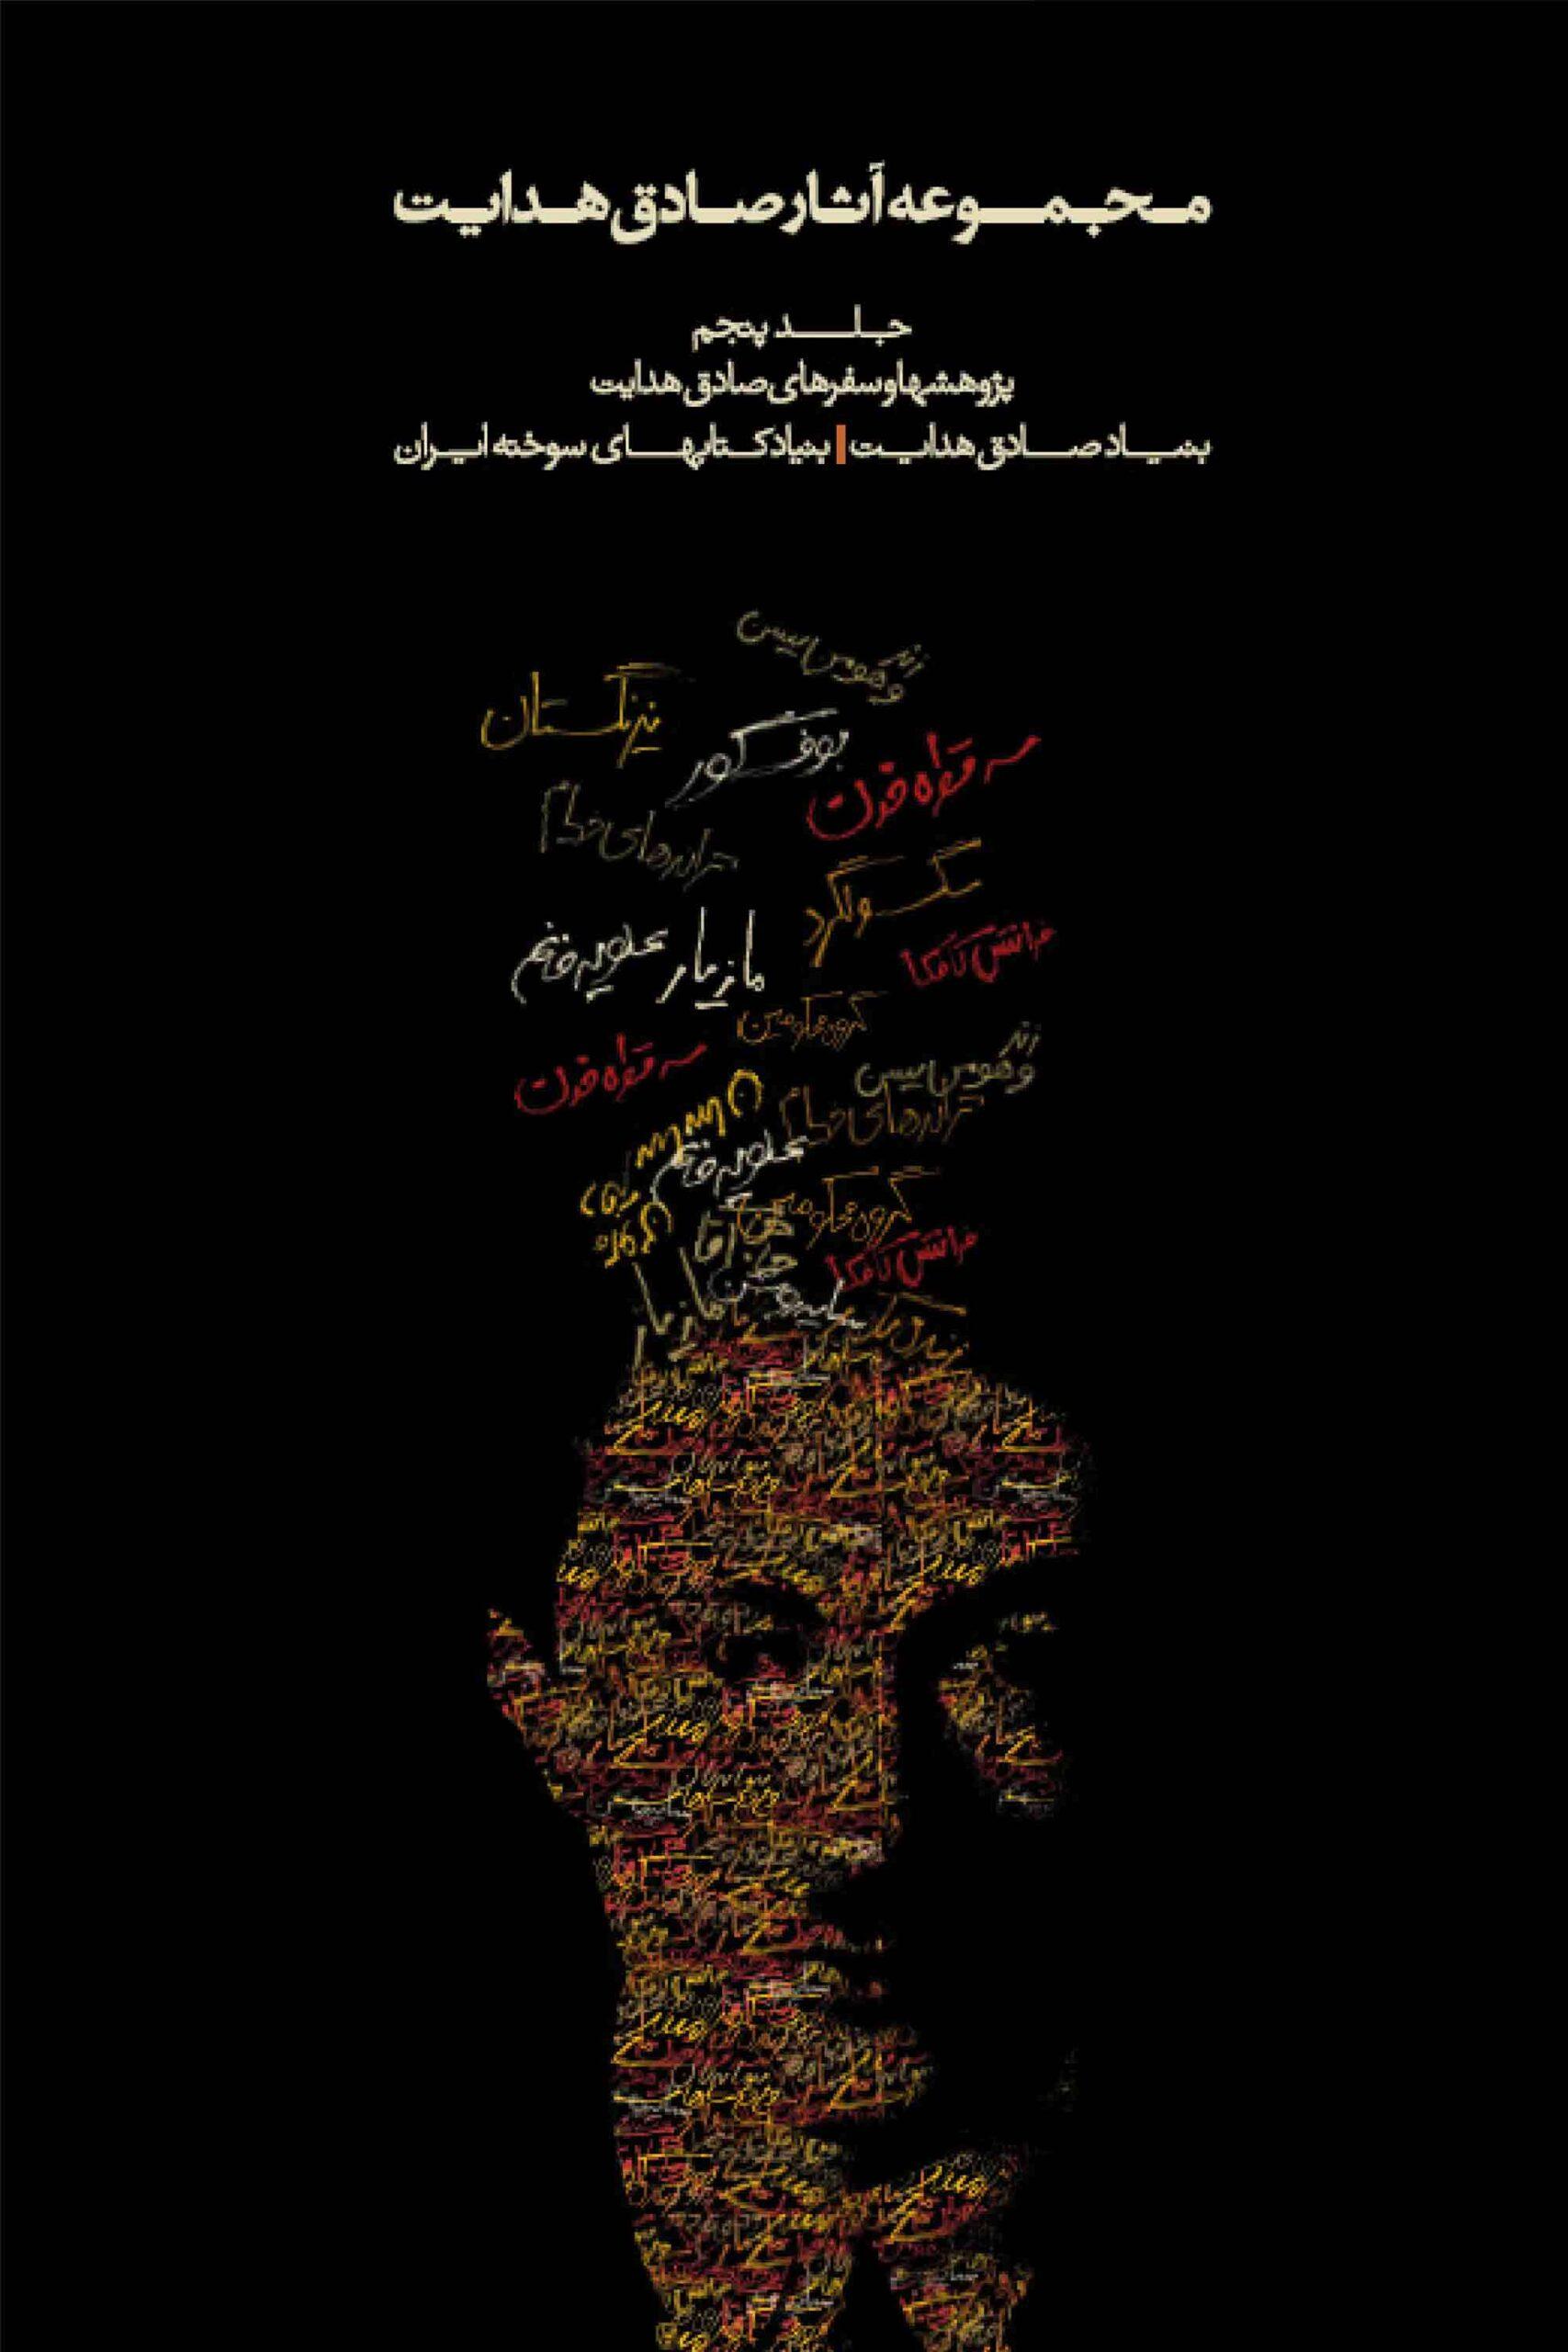 Sadegh Hedayat Vol. V – Studies and travels